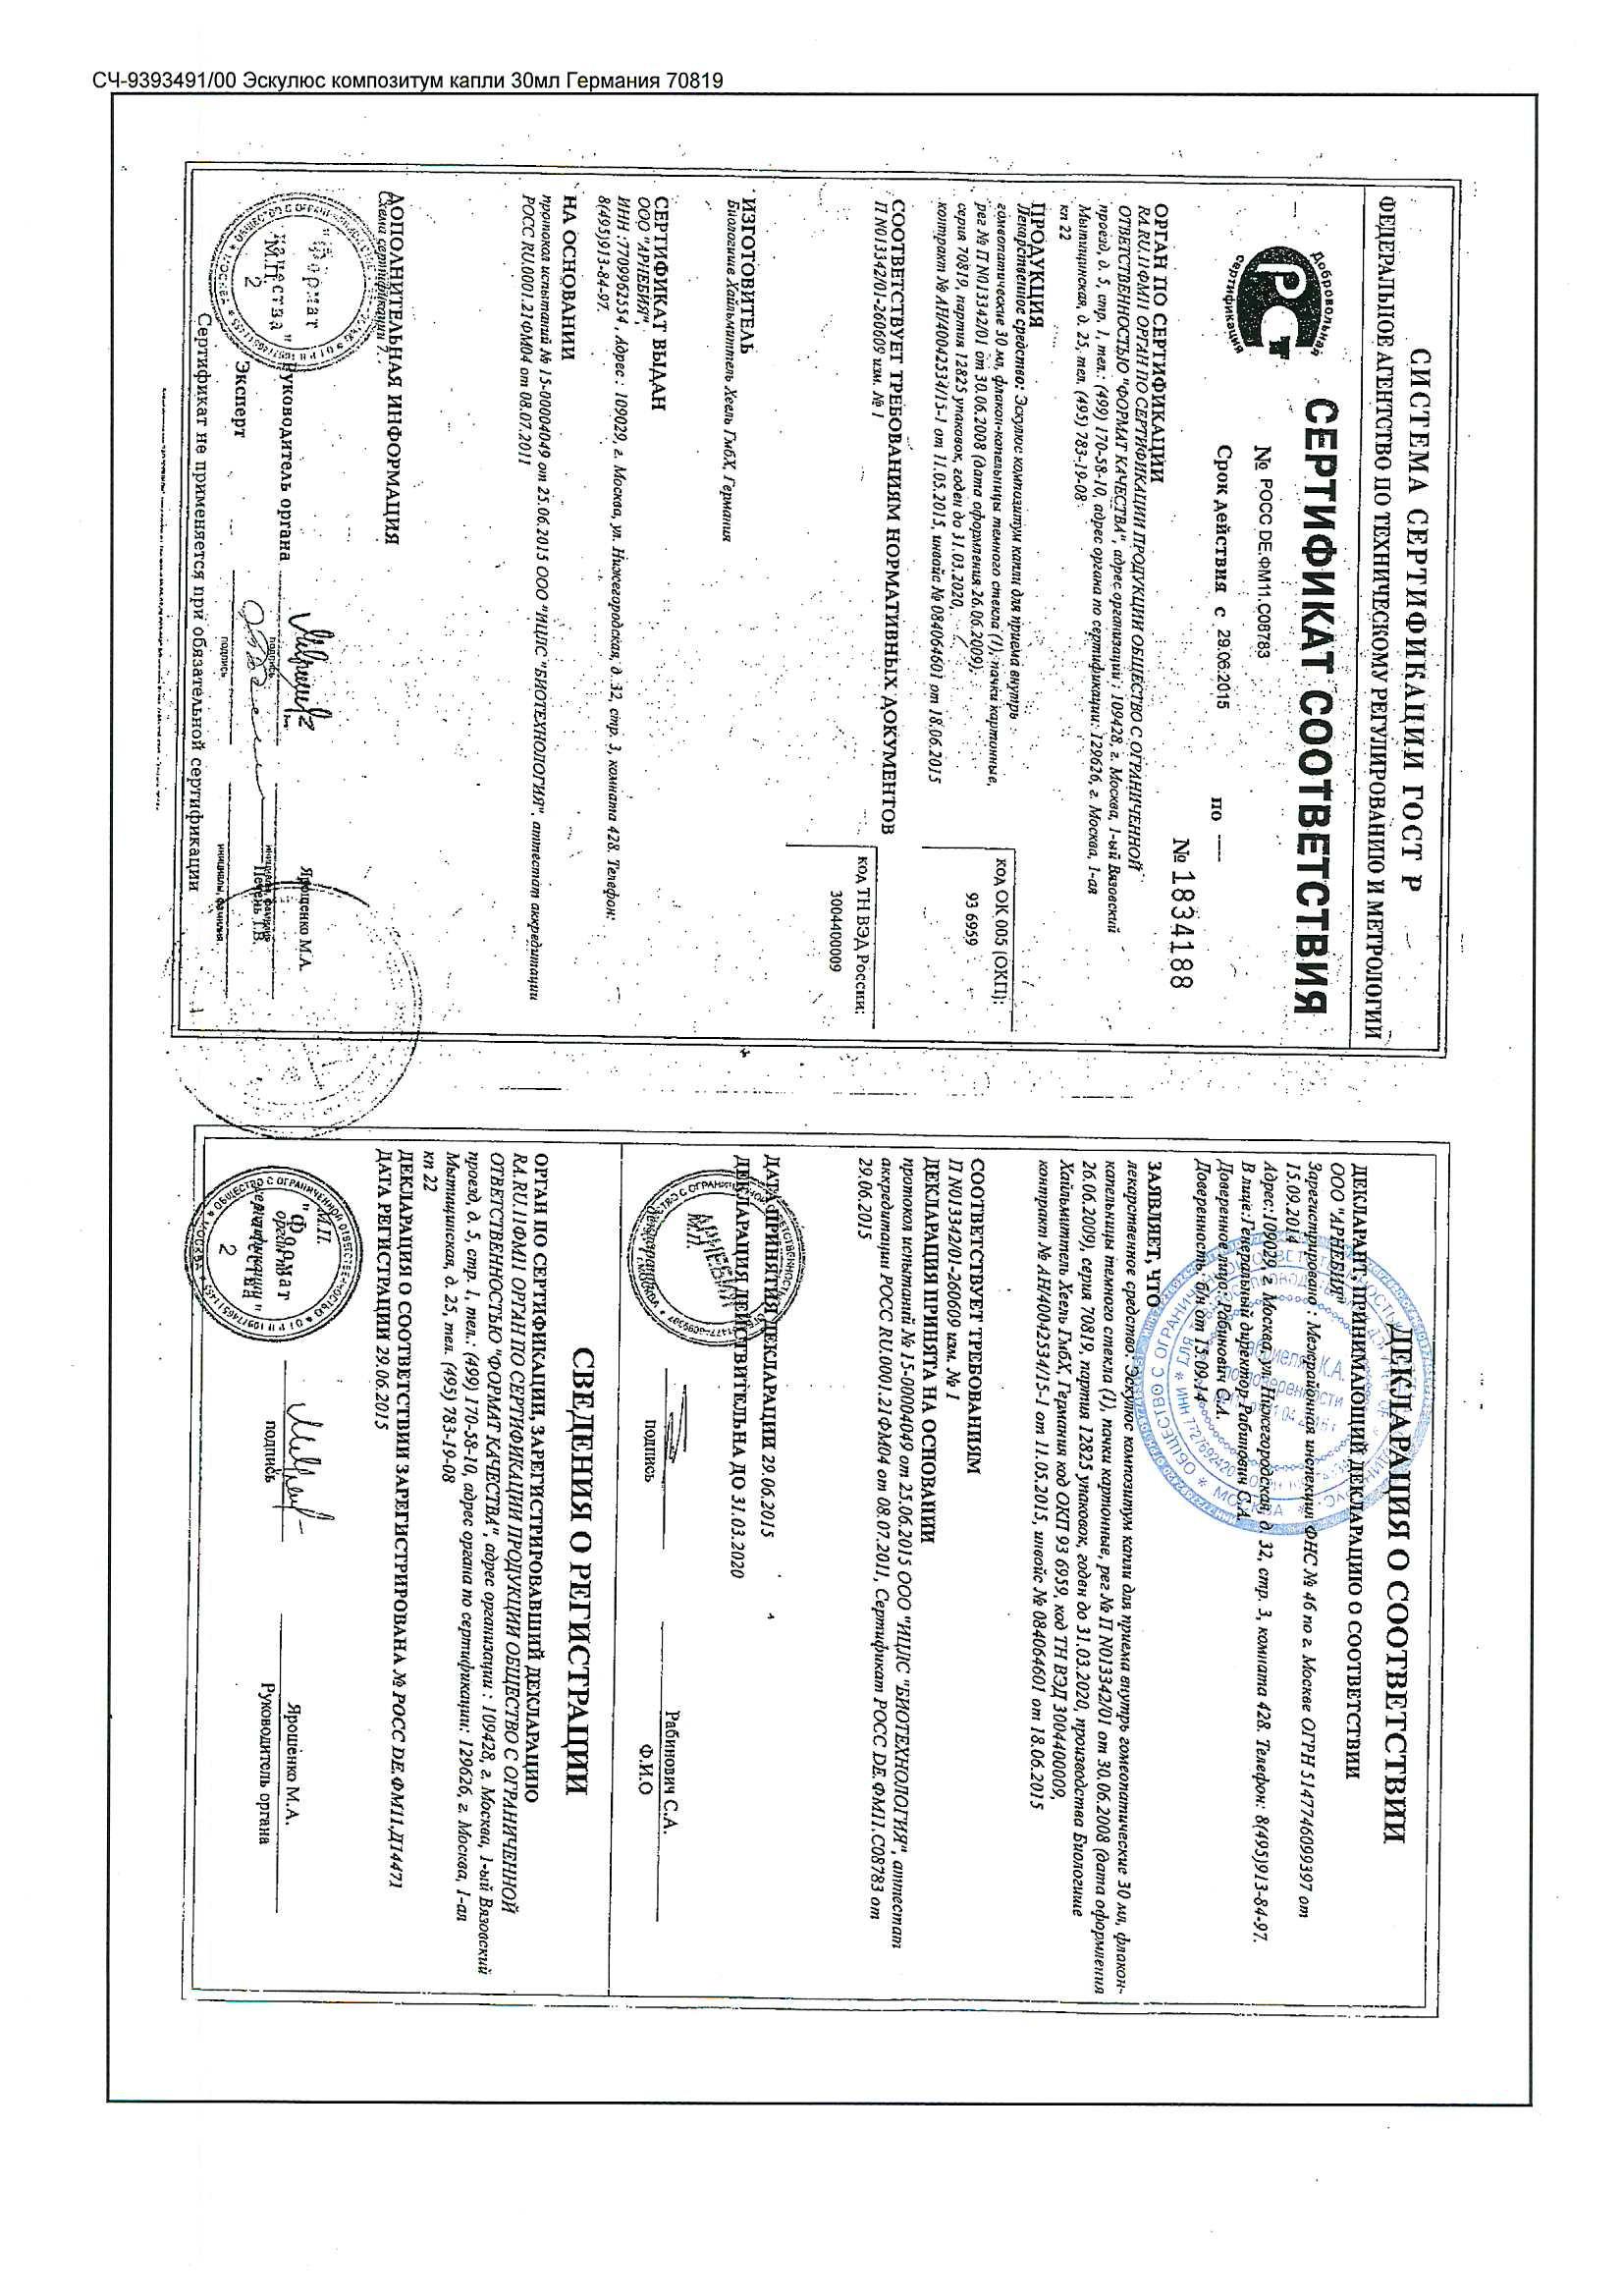 https://avisfarm.com/i/lek/certificates/77721643/11862-00939997.jpg?id=41